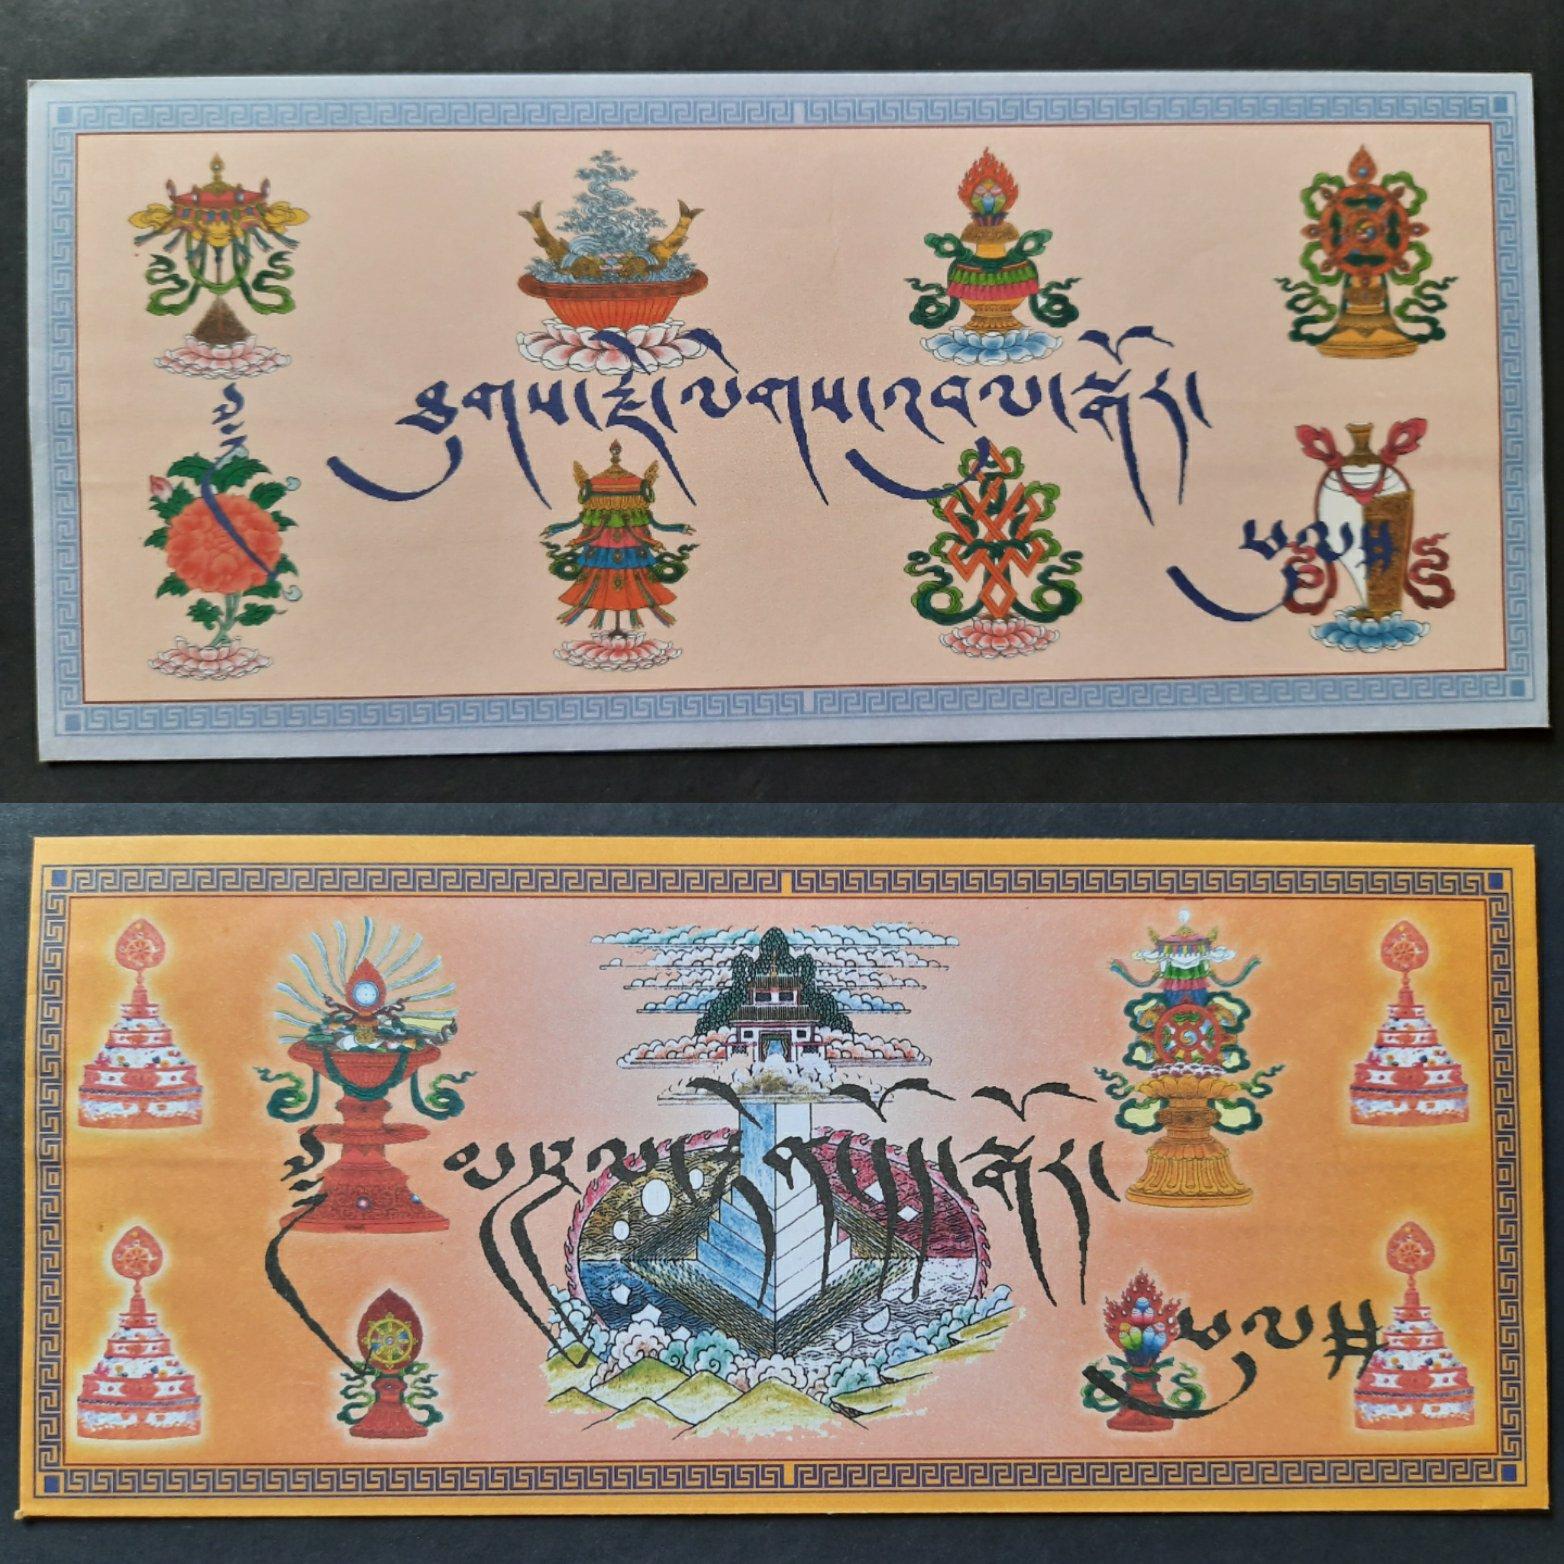 Tibetan art in modern gifts